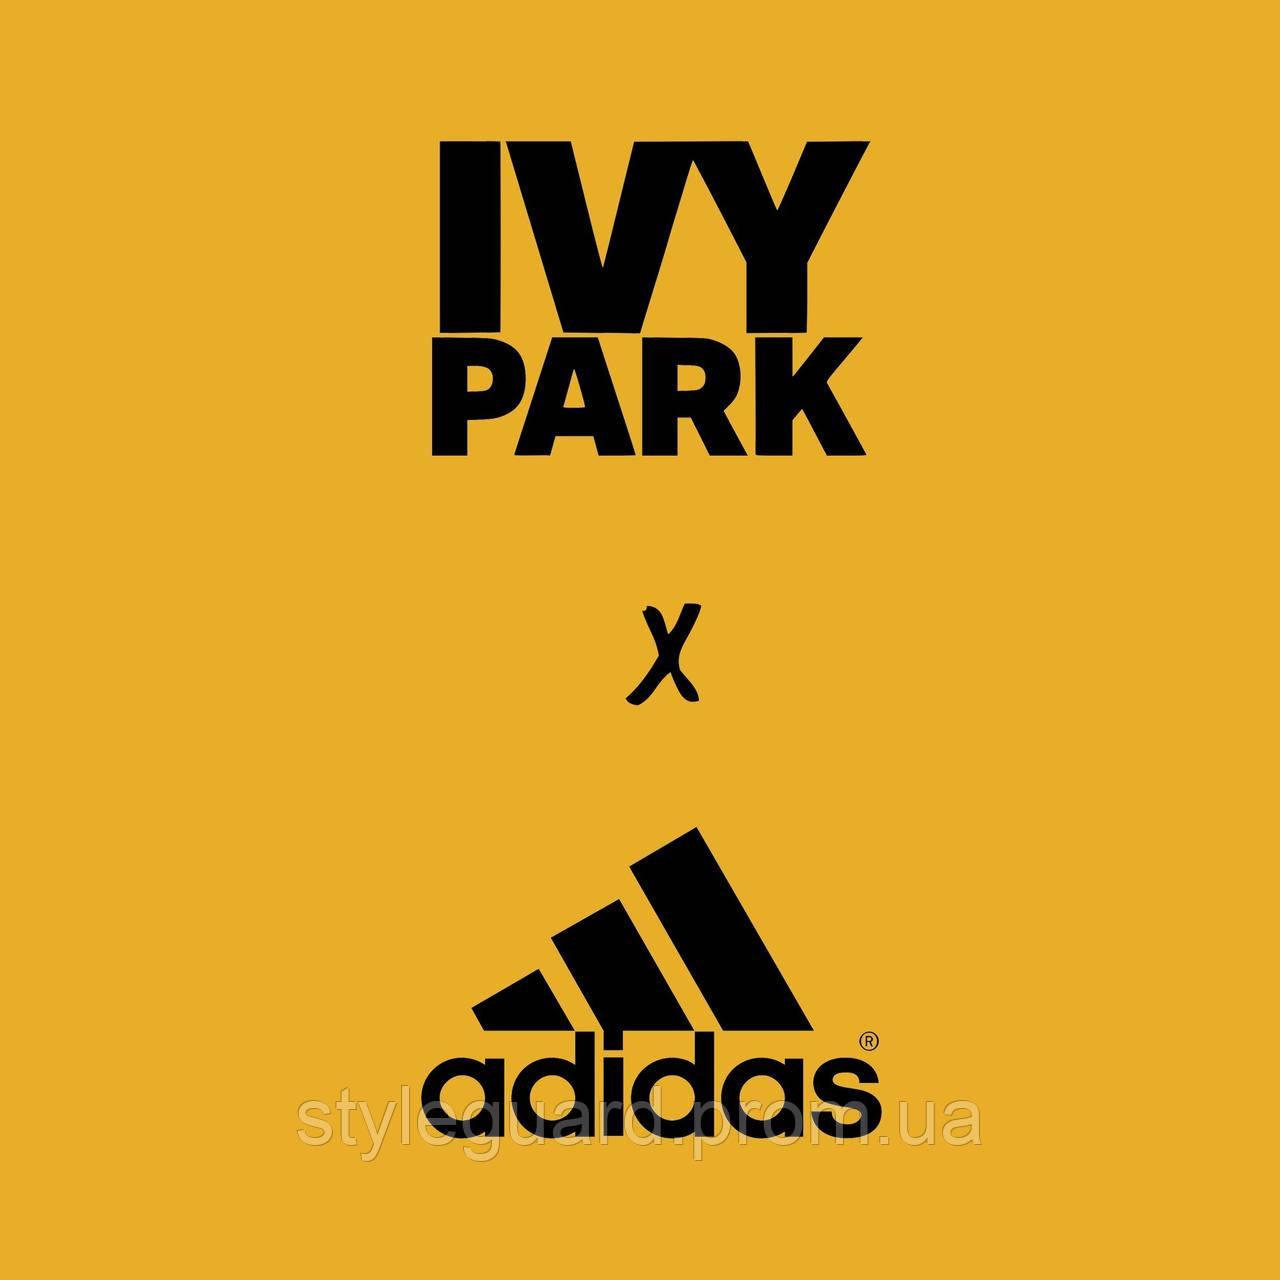 Ivy Park & Adidas